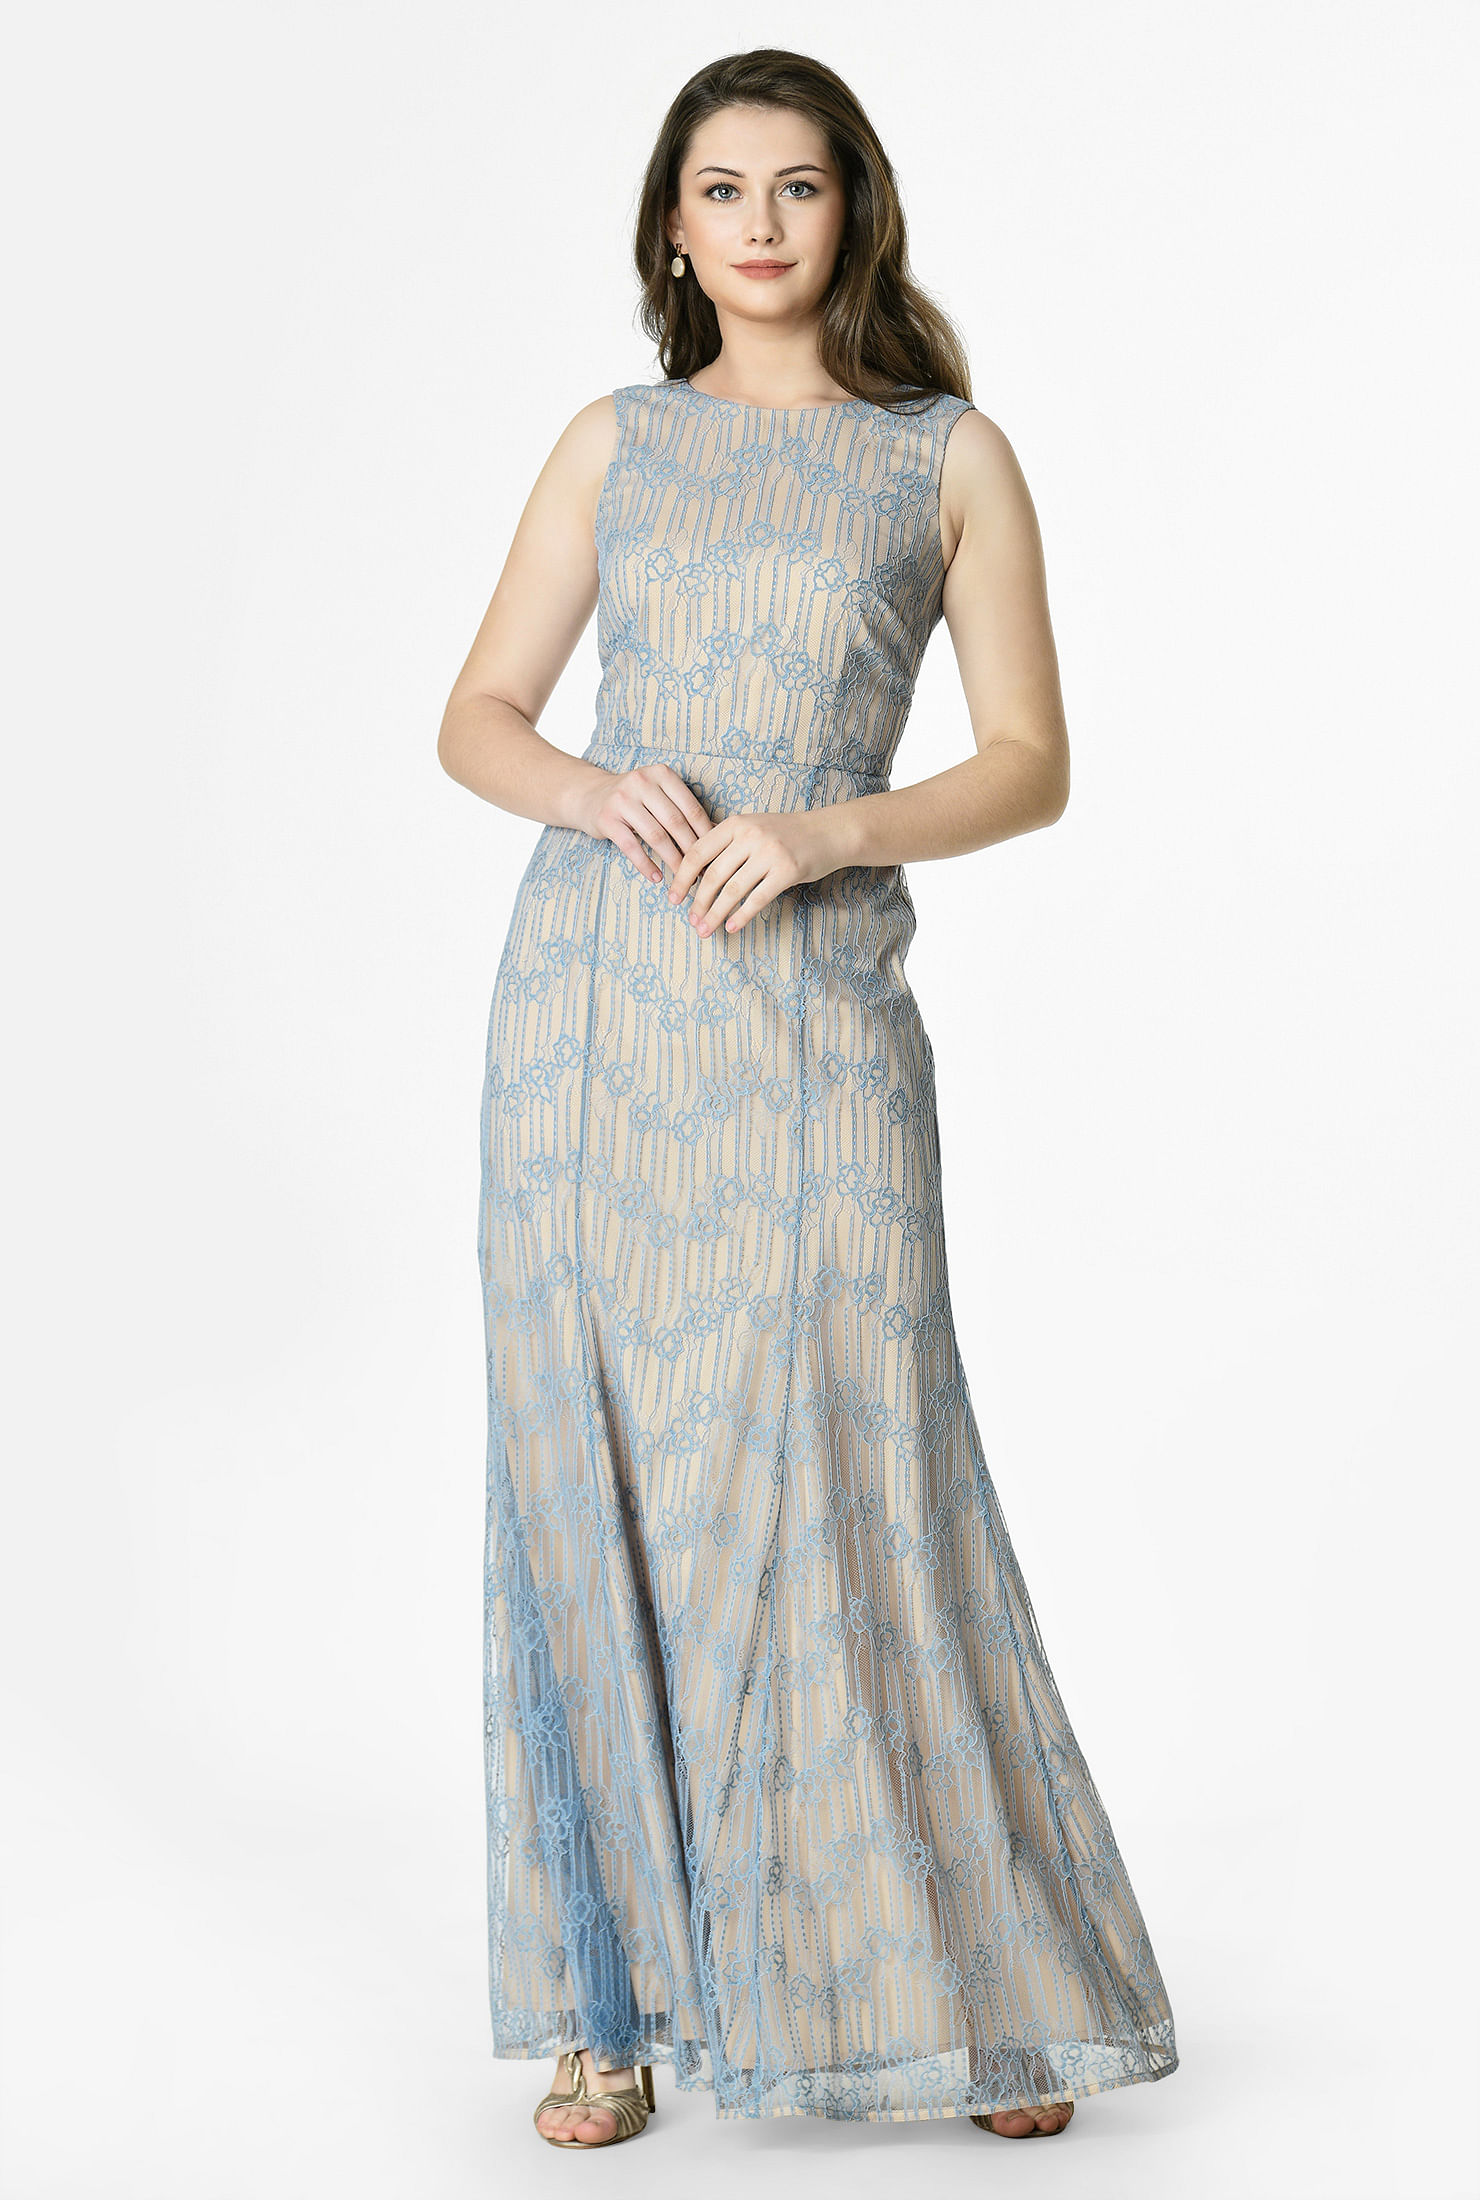 aa4eada8 Women's Fashion Clothing 0-36W and Custom